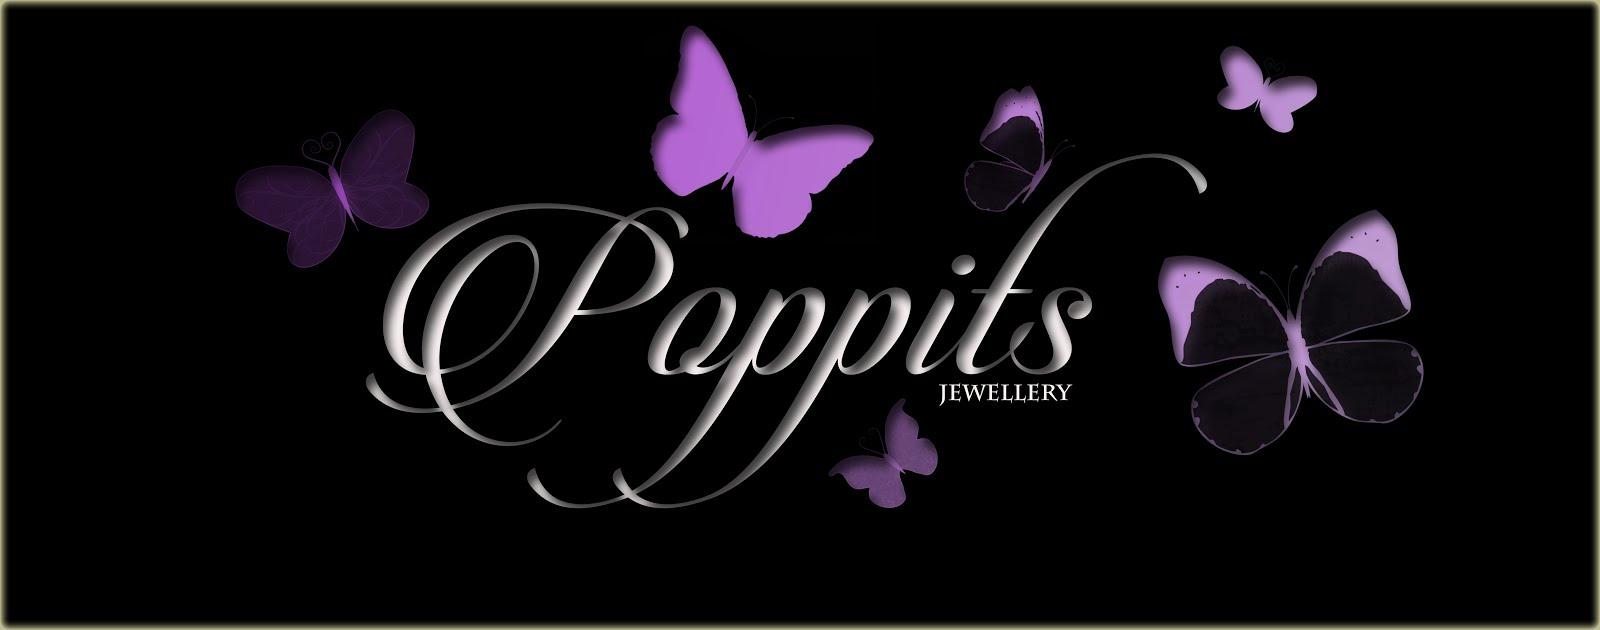 Poppits Jewellery